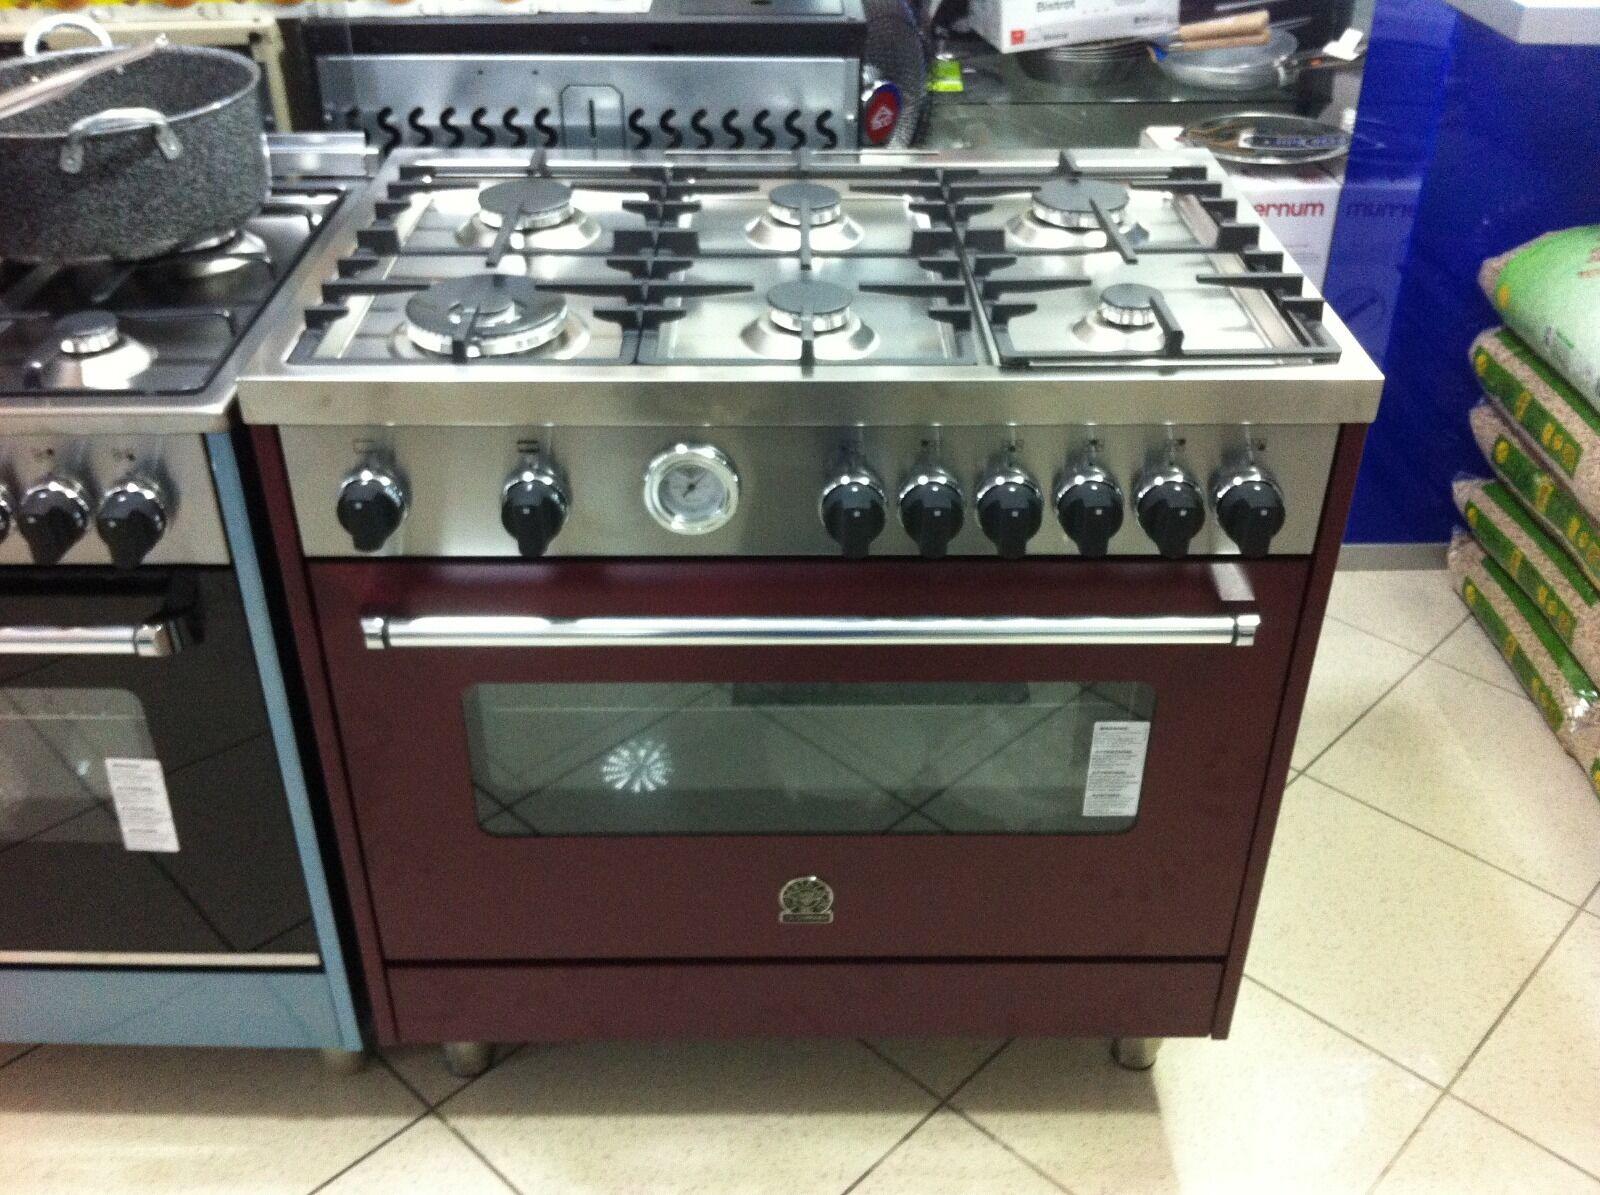 Cucina a gas la germania 90x60 6 fuochi forno gas - Cucina a gas da 90 ...